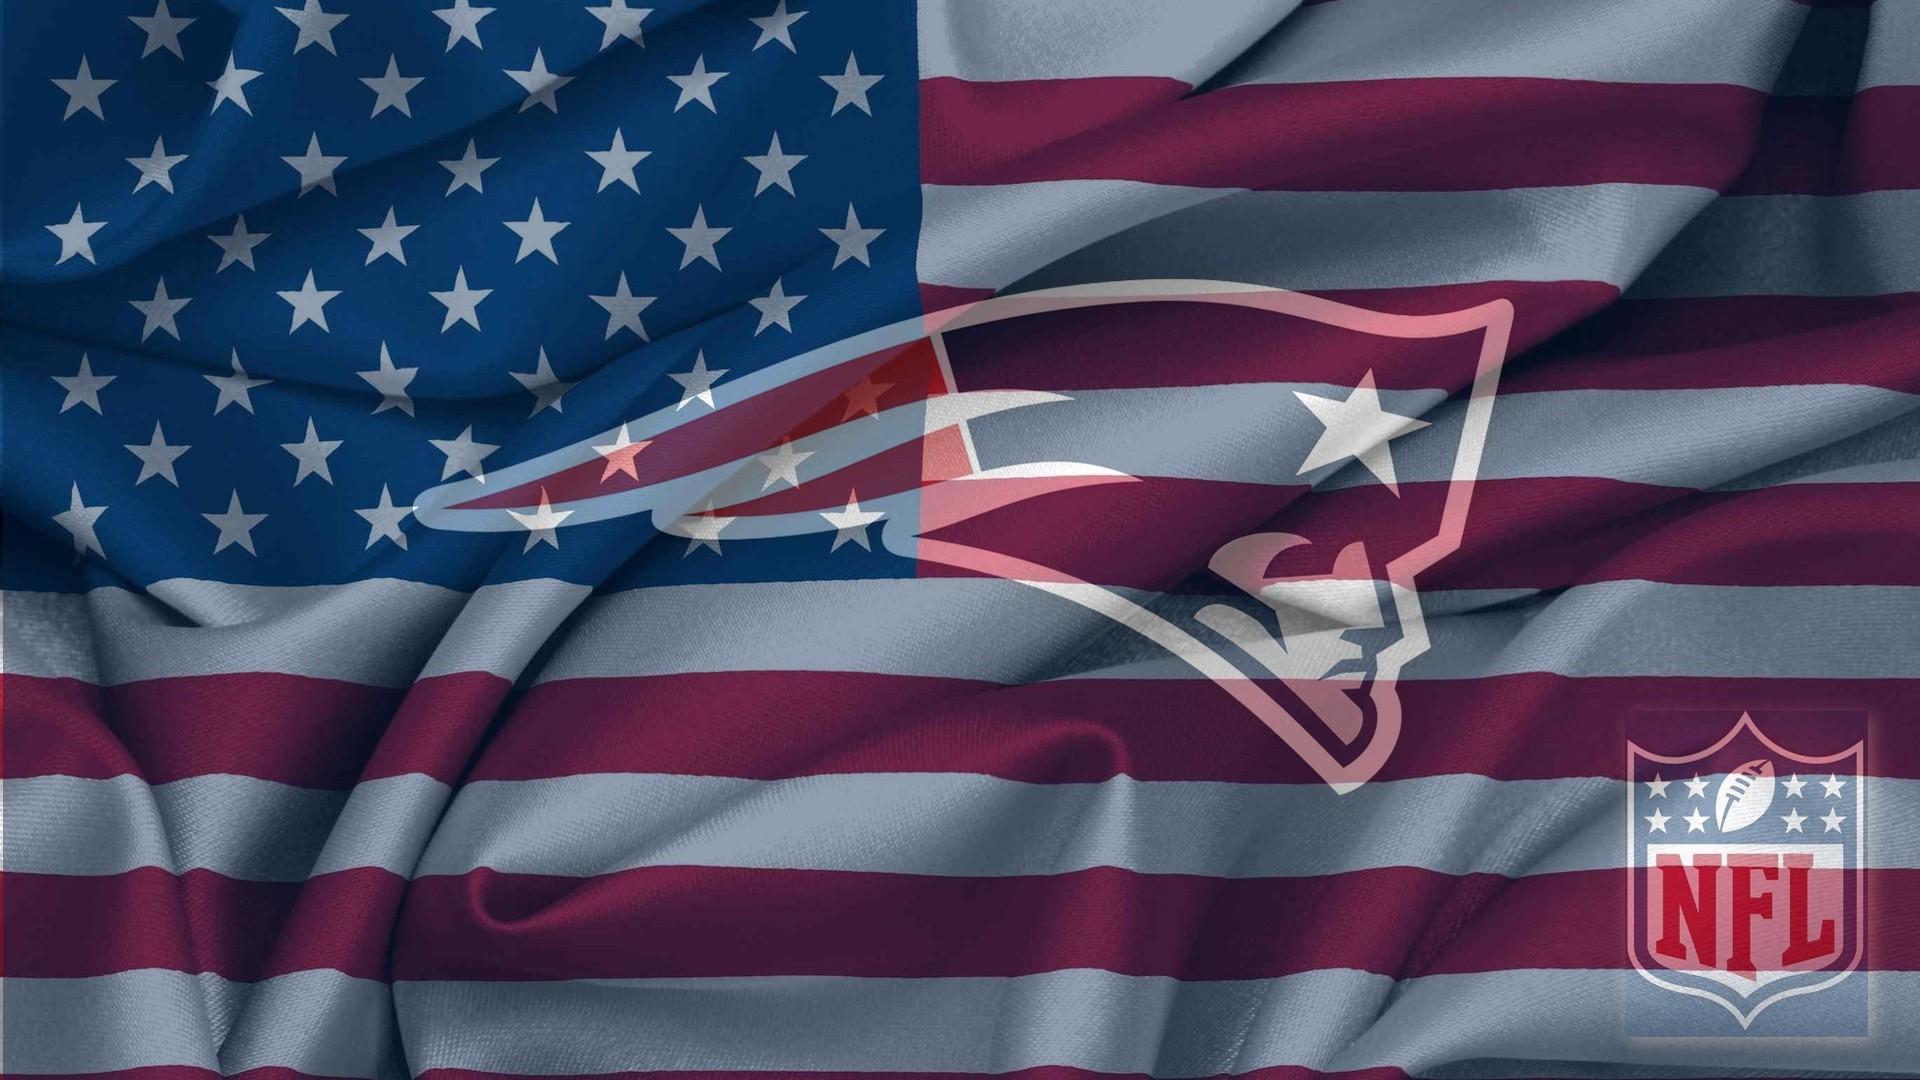 New England Patriots Logo With NFL Logo On USA Flag Wavy Canvas .